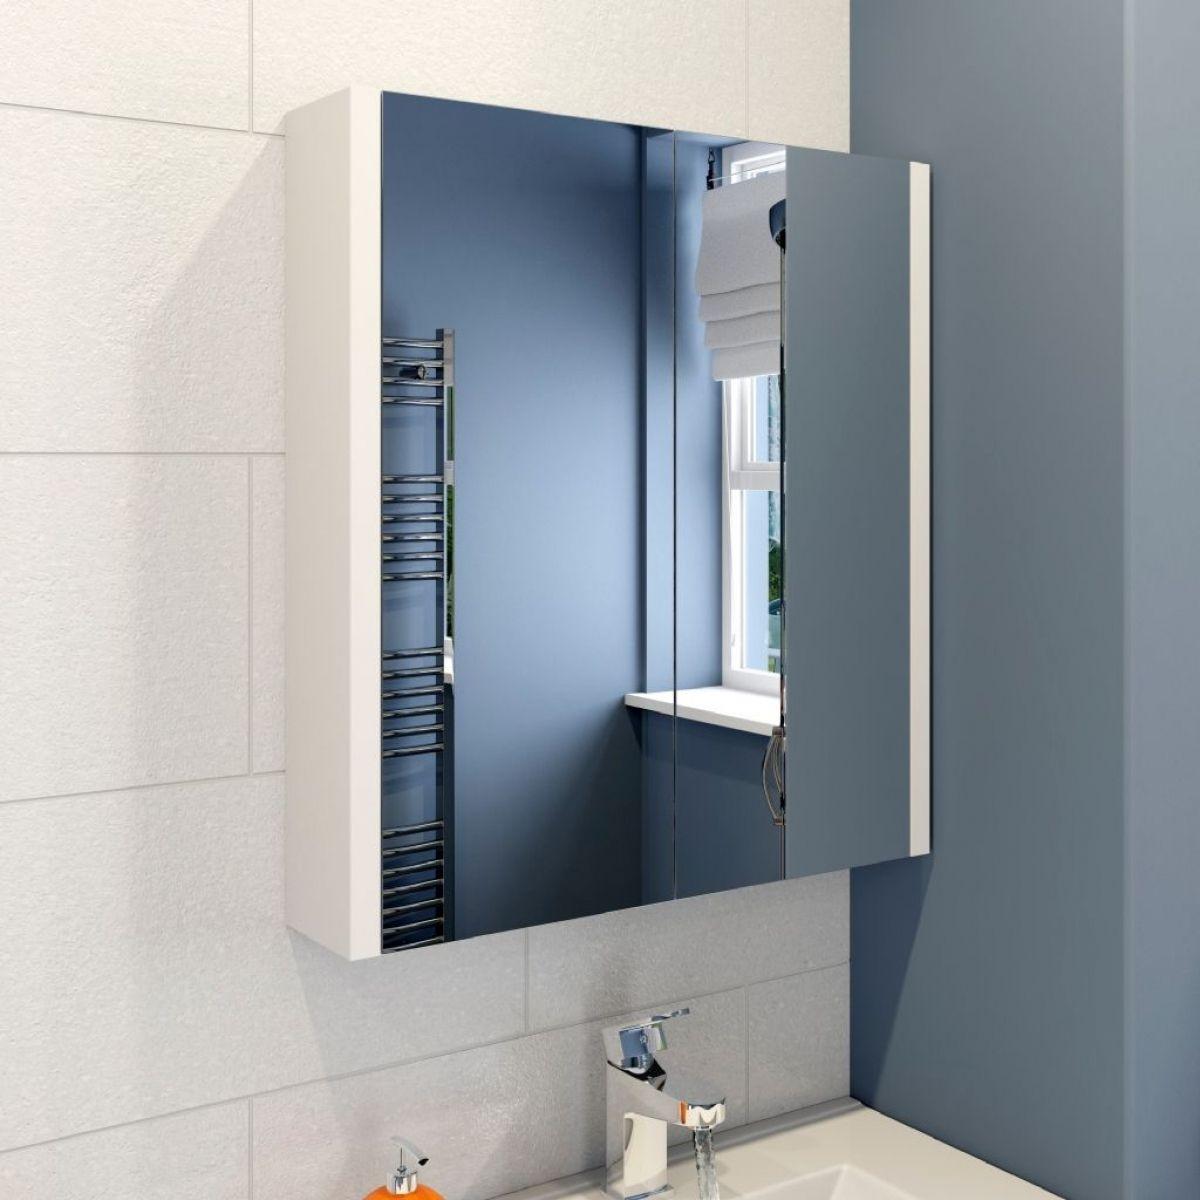 Icona Classic White Mirrored Bathroom Cabinet 600mm 7998 Inside